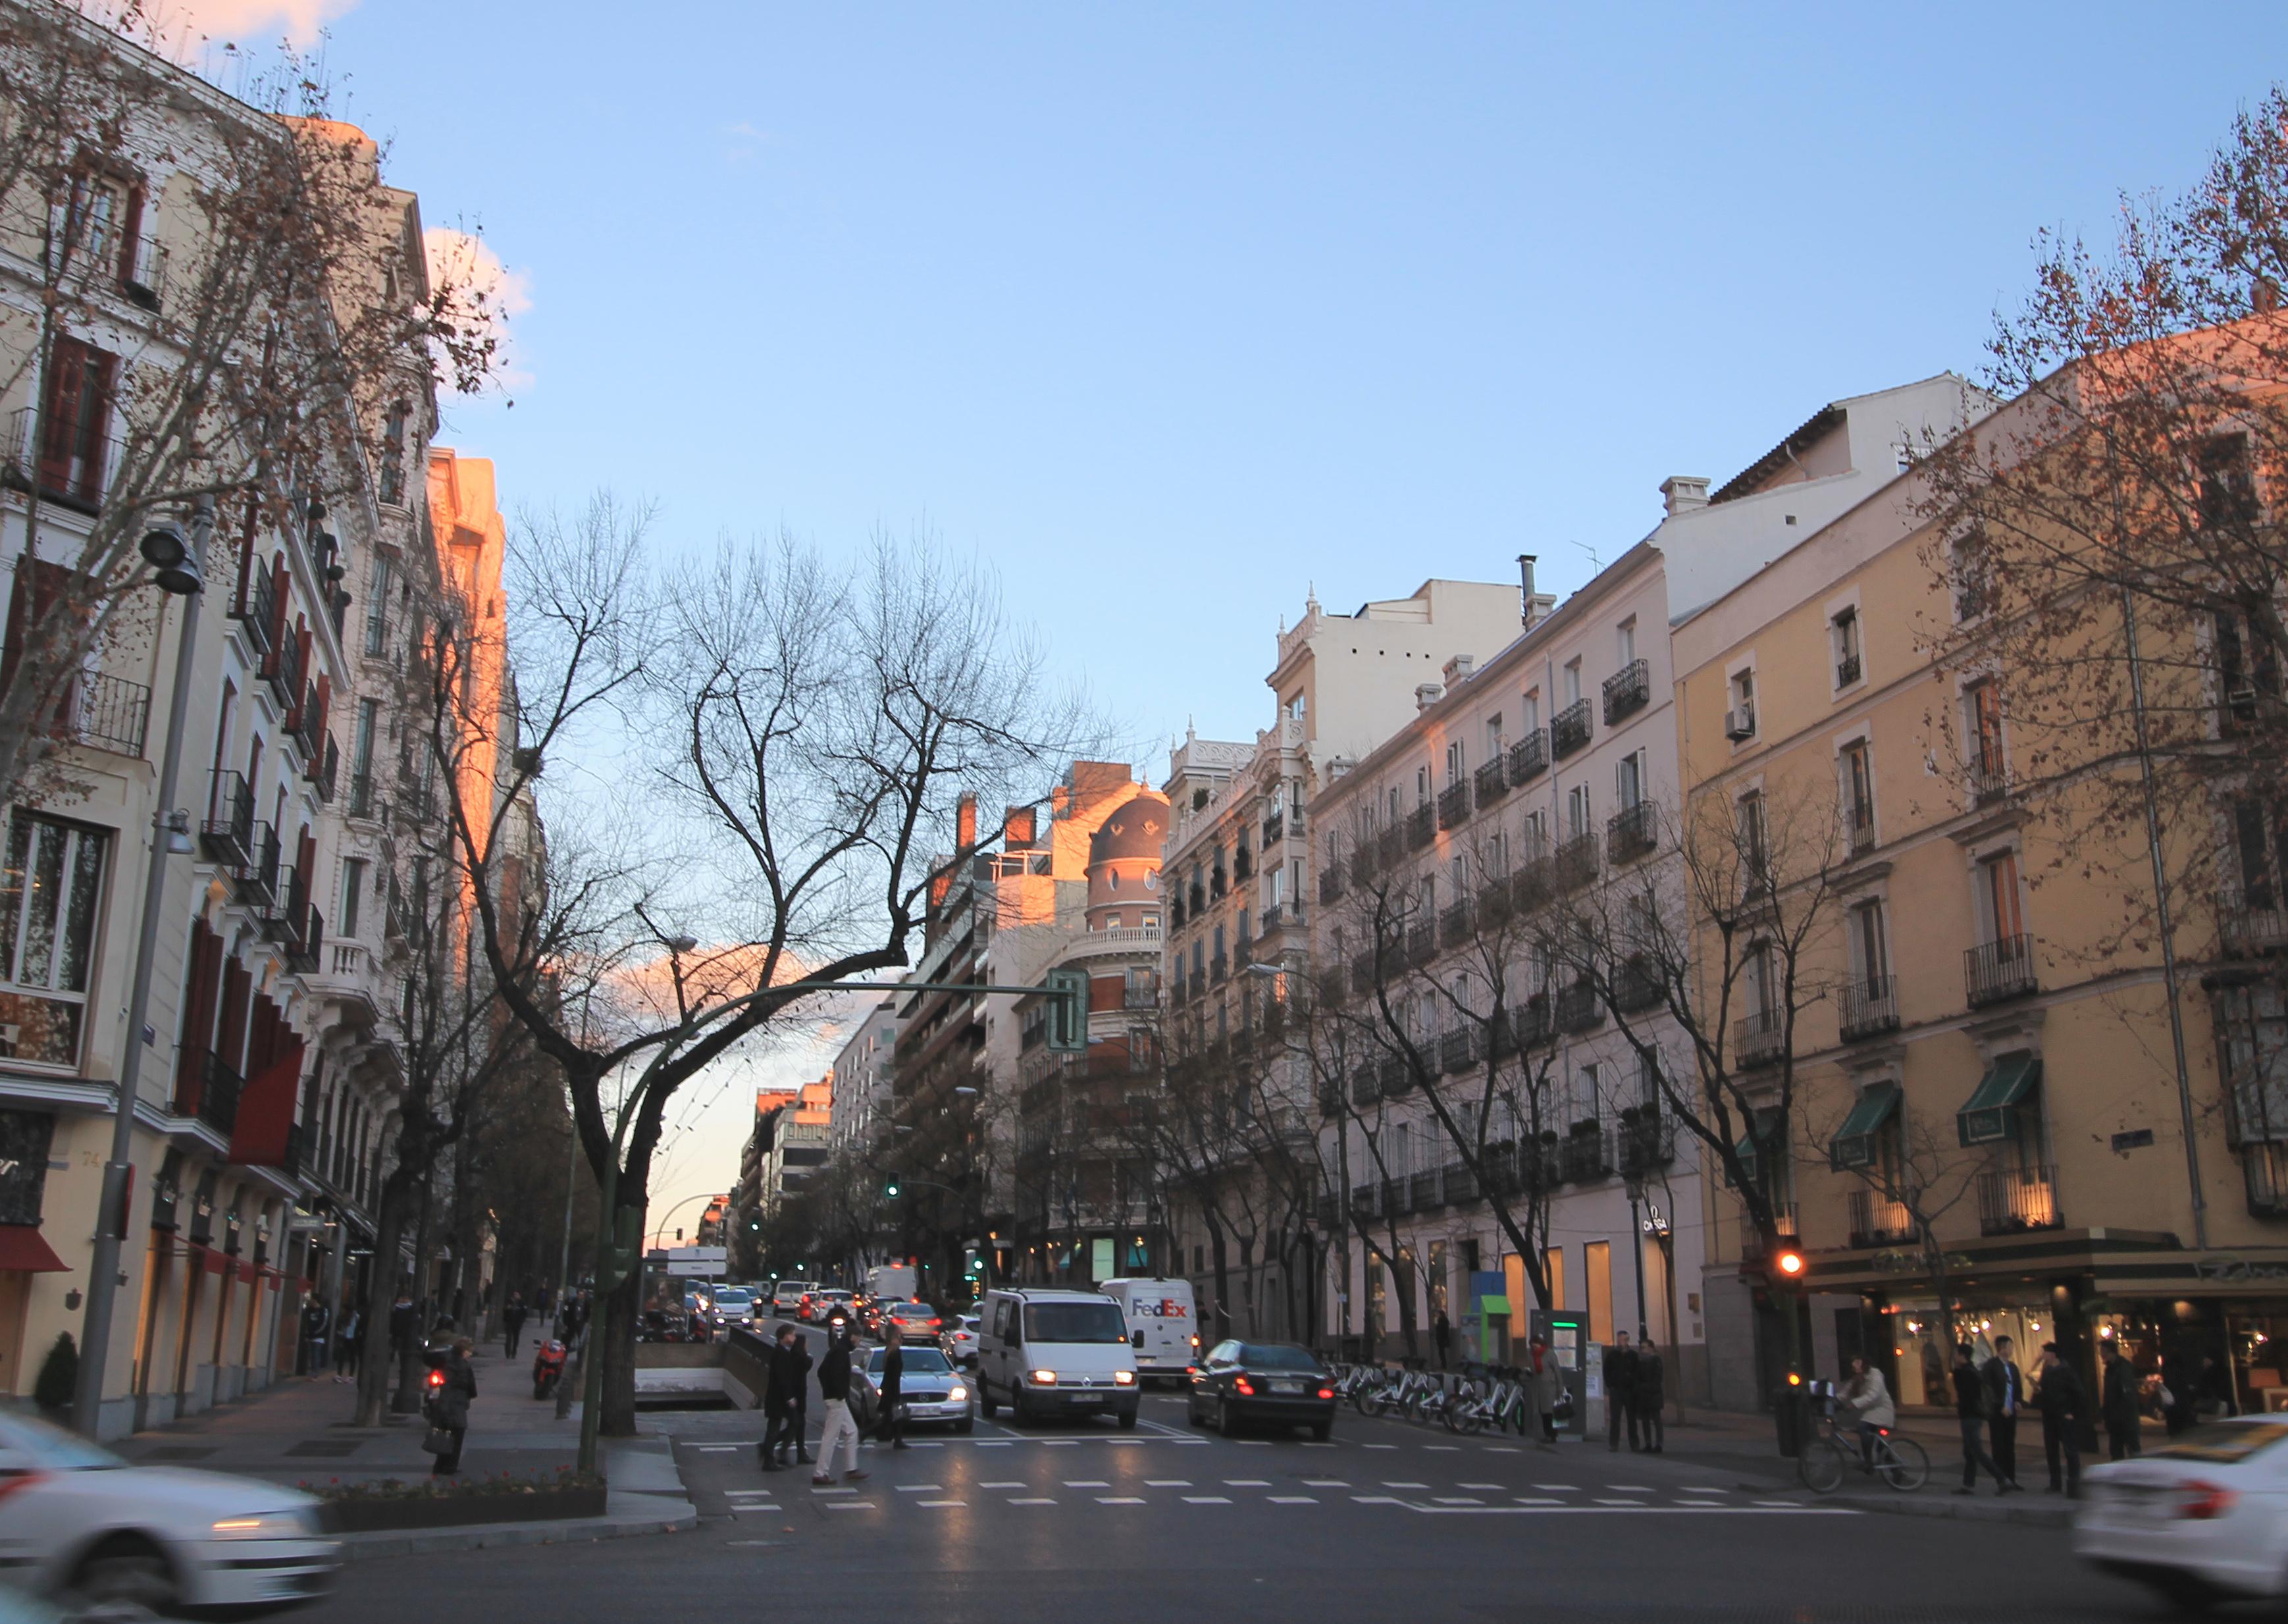 Imagen de la Calle Ortega y Gasset, donde Vastned pretende desinvertir / Wikimedia commons